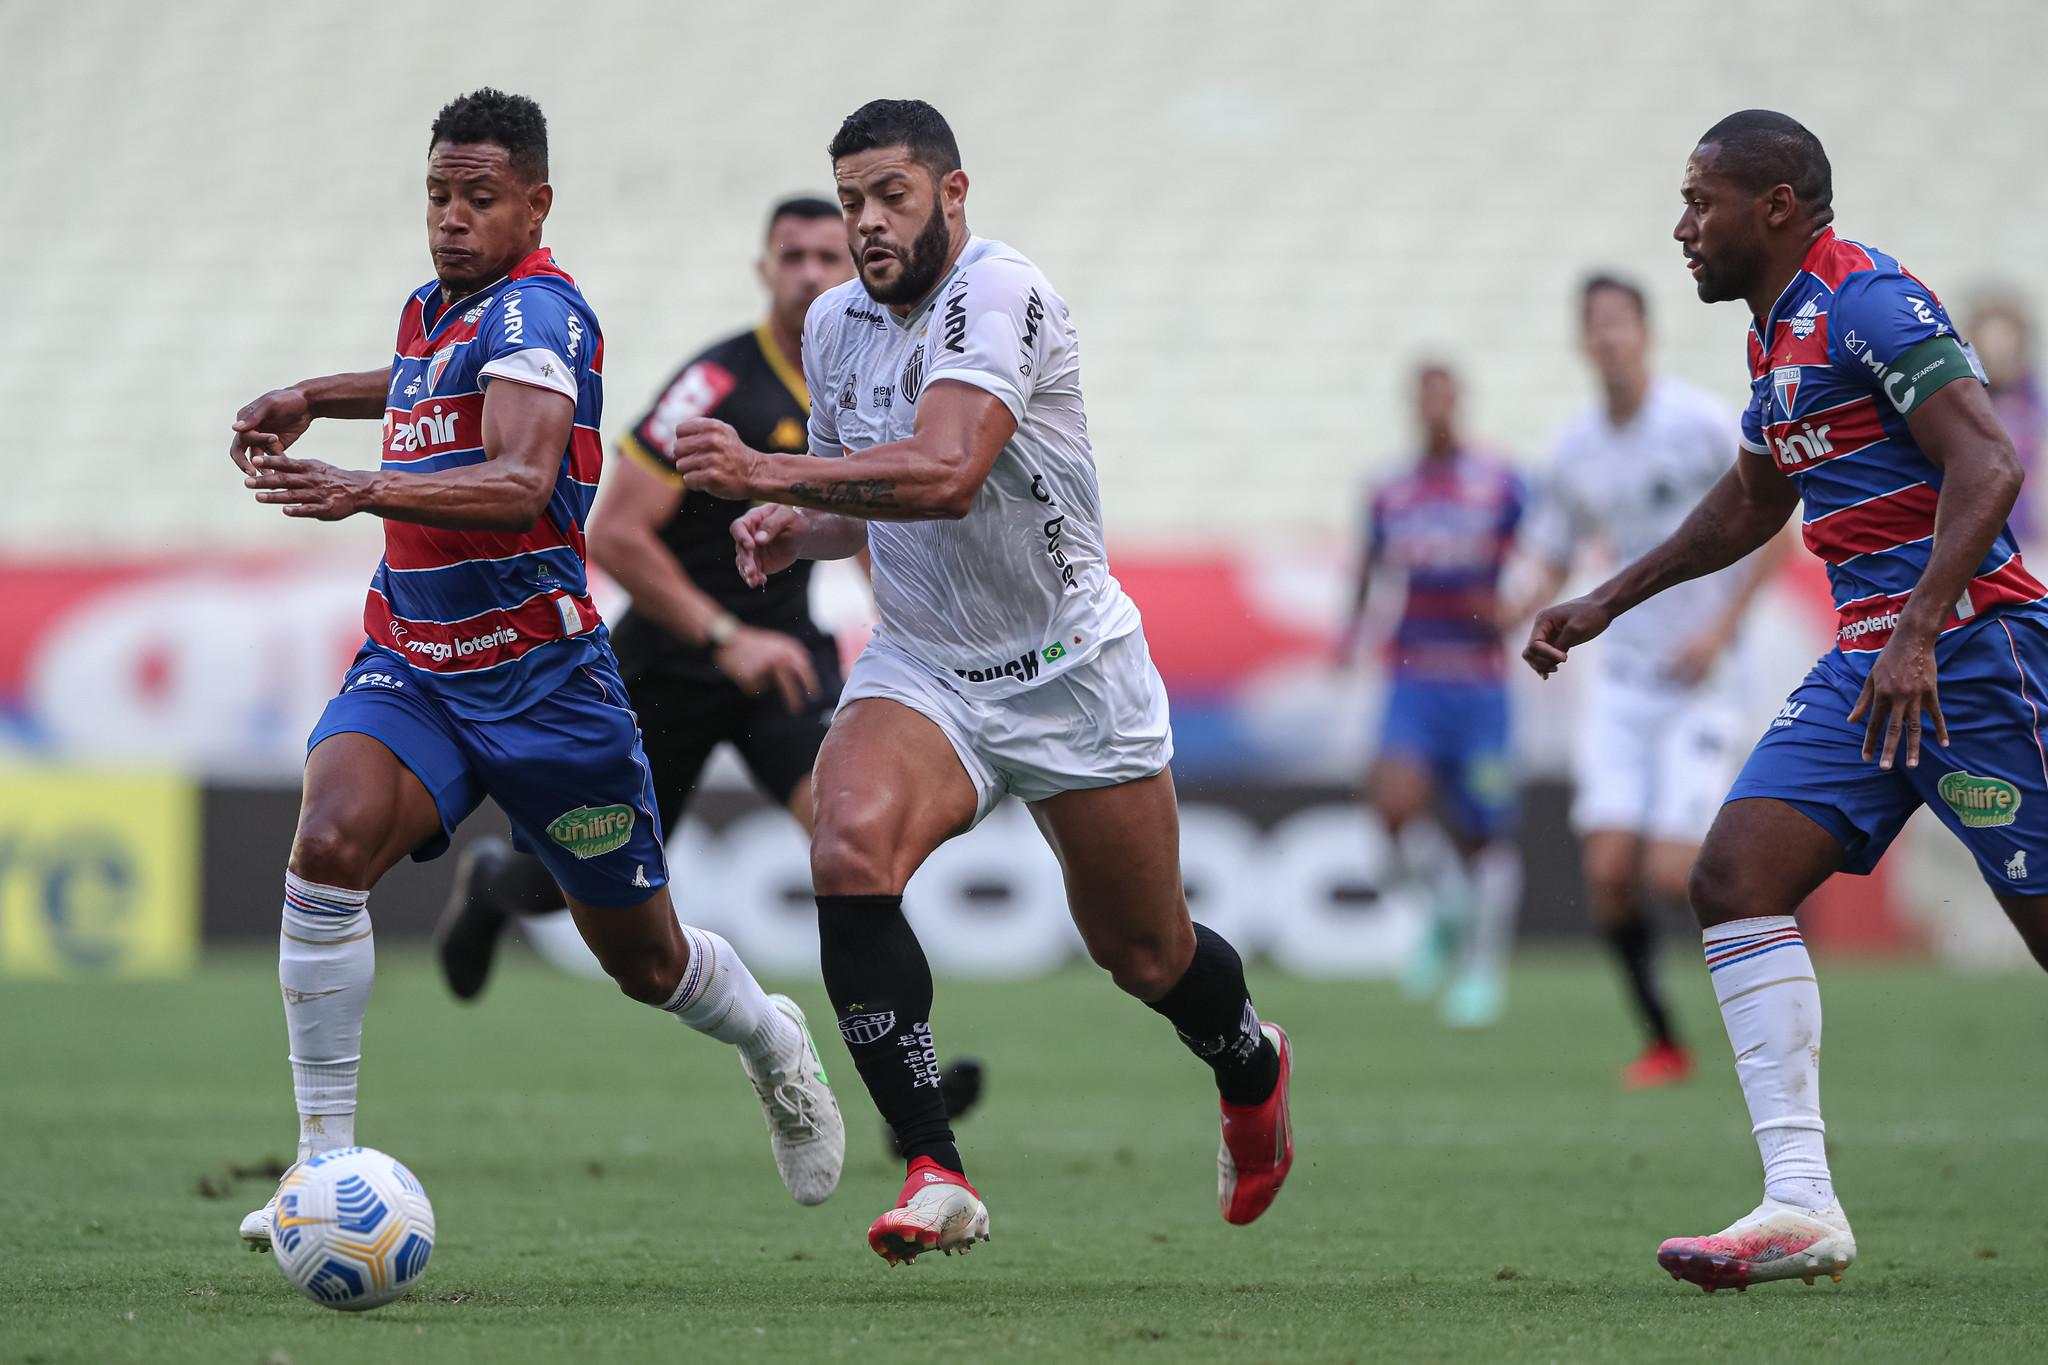 Reforçado, Atlético enfrenta o Fortaleza pela Copa do Brasil